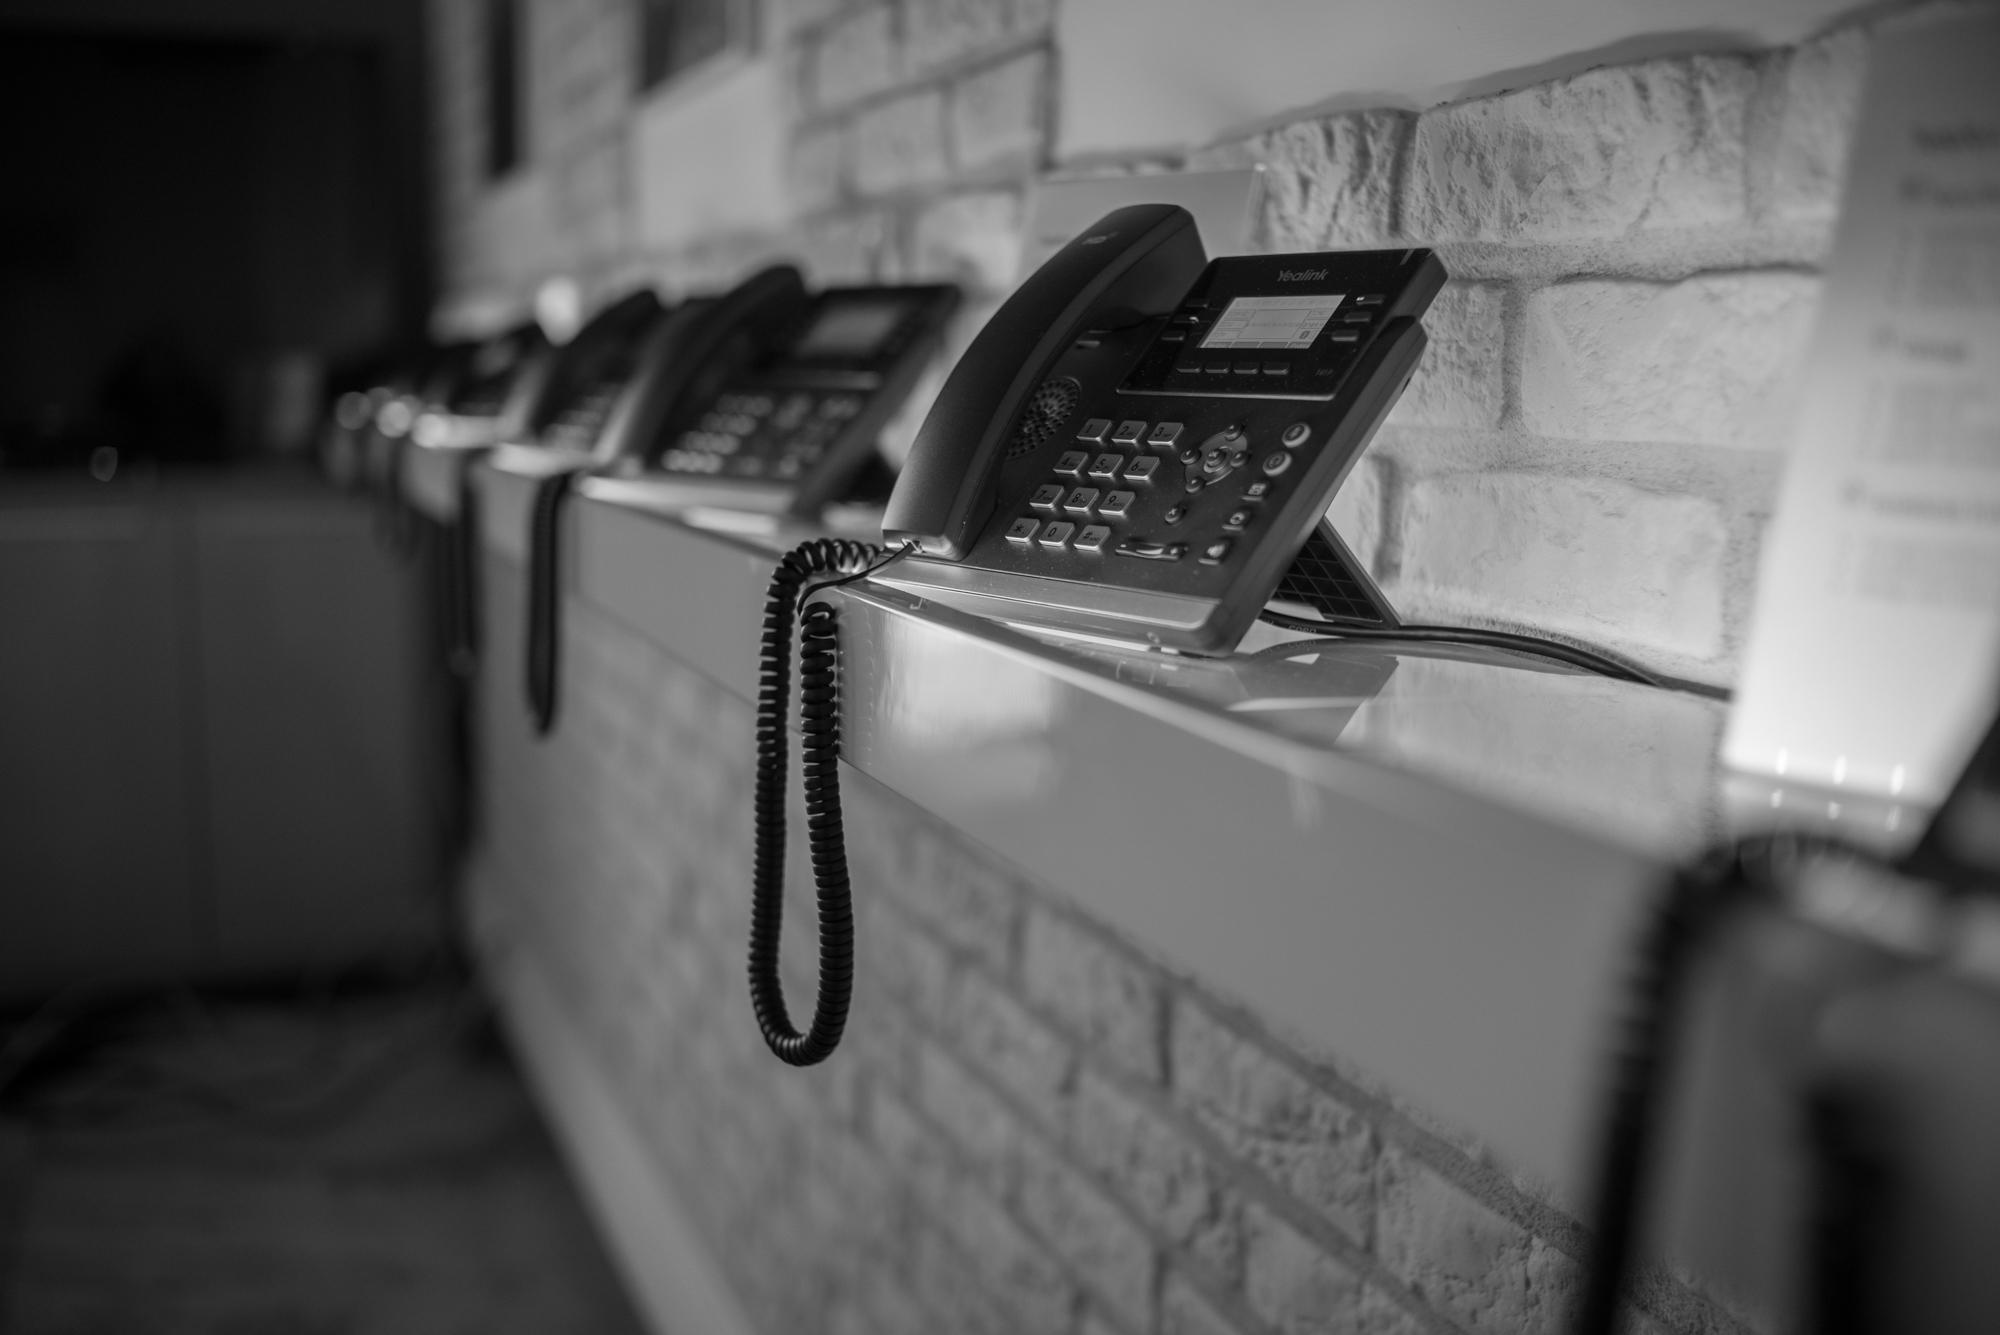 Demo Room telefony